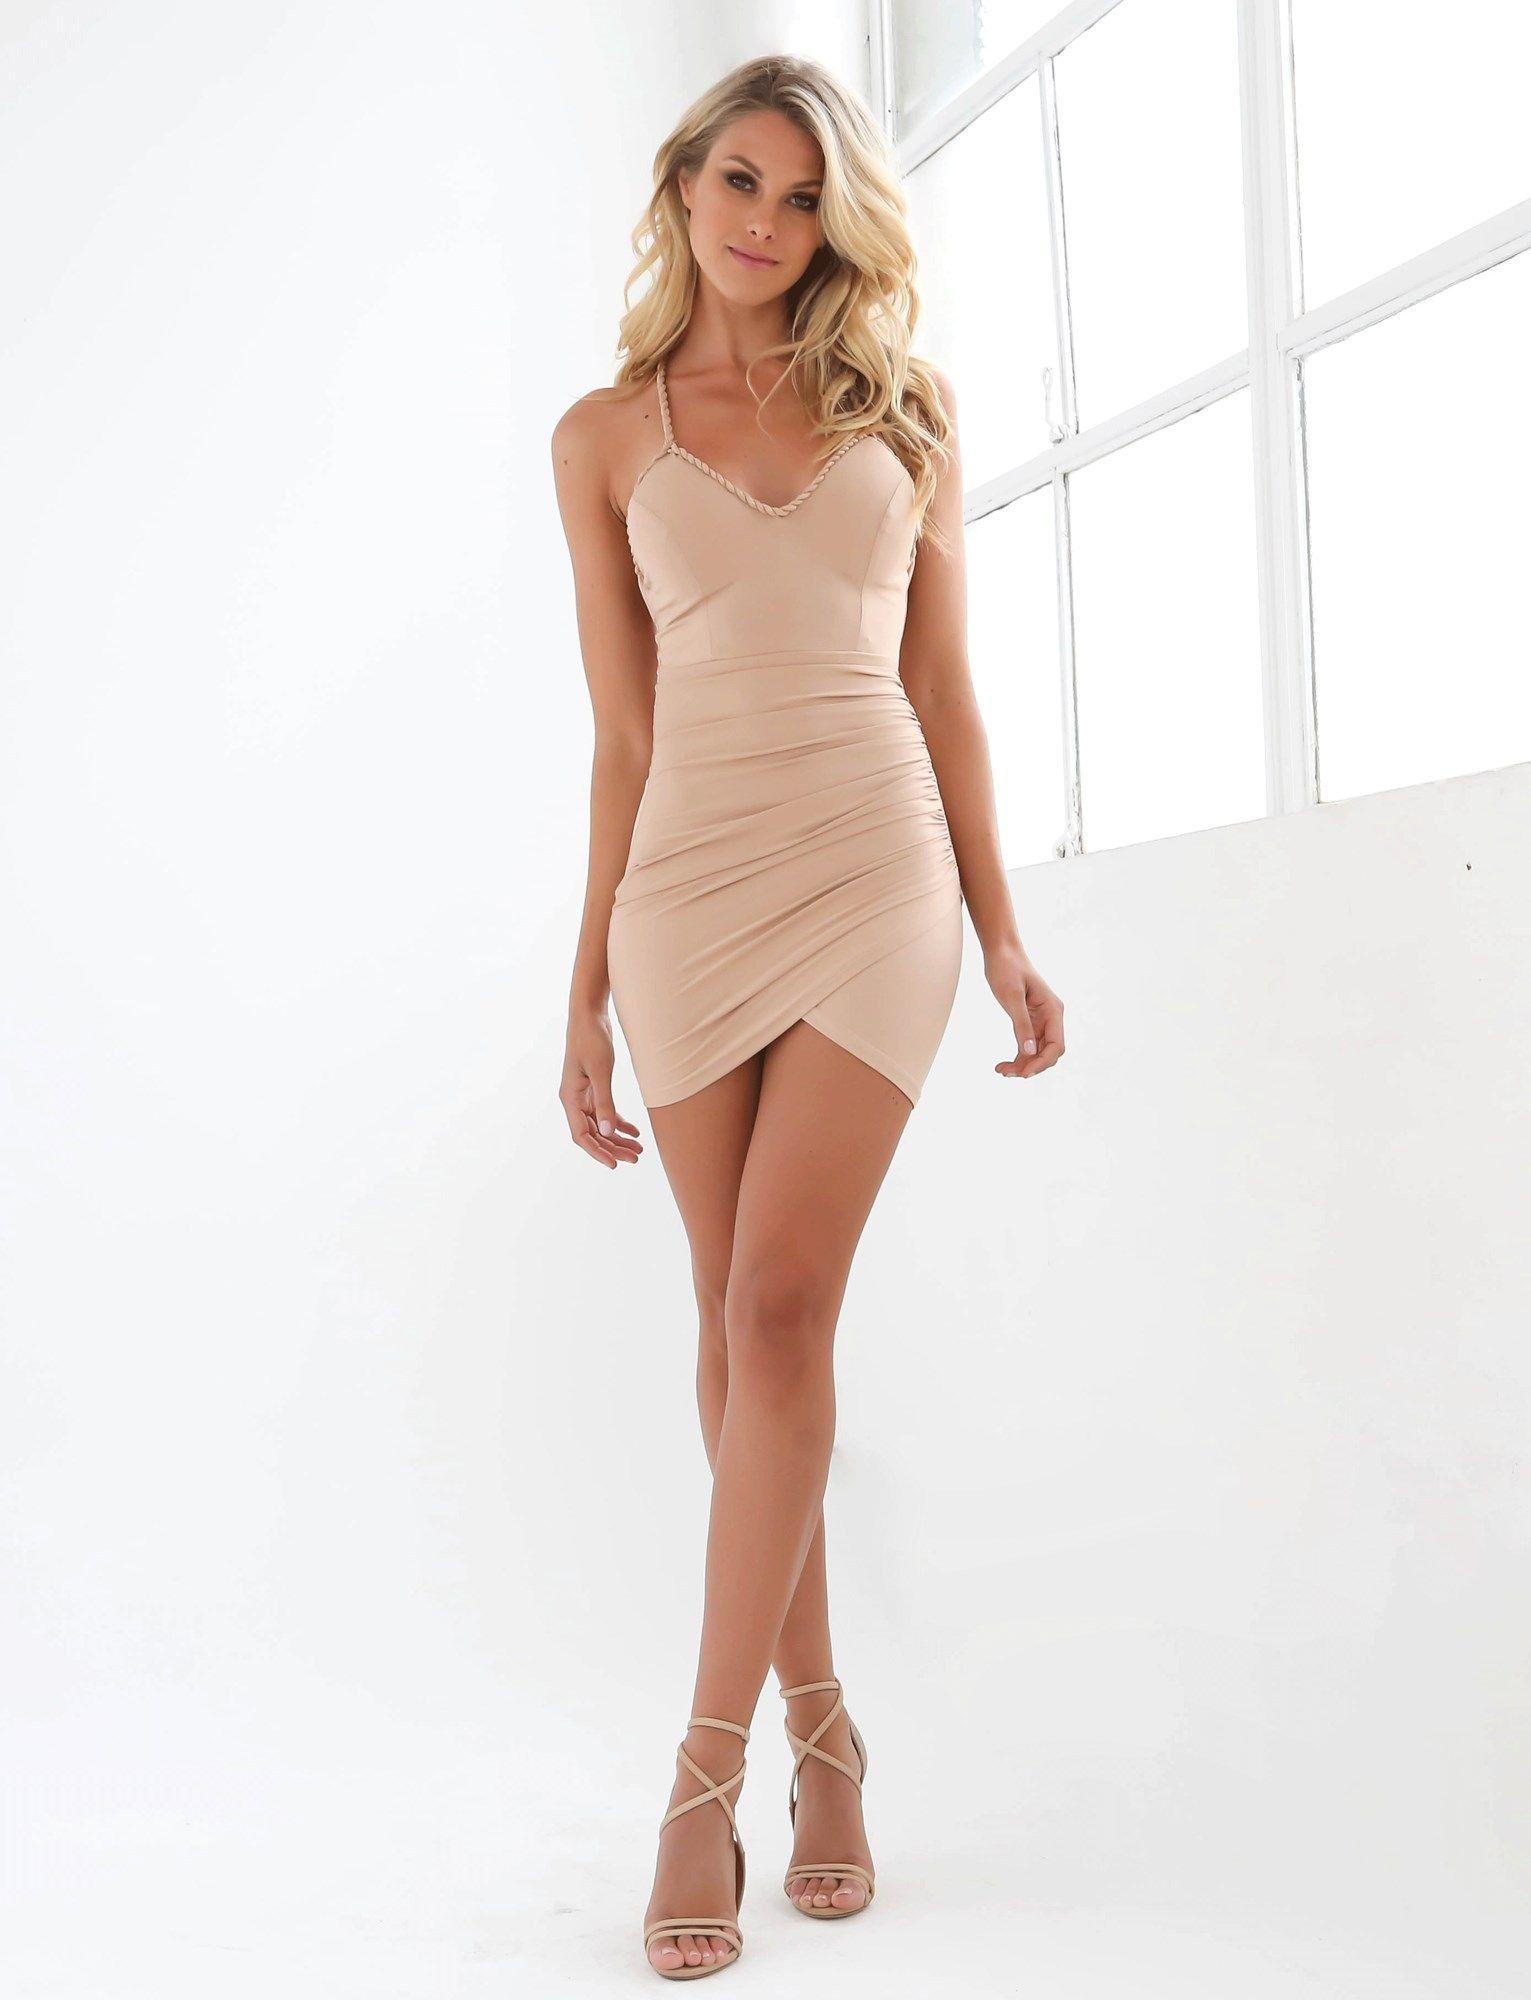 Hot Natalie Jayne Roser naked (14 photos), Topless, Cleavage, Boobs, in bikini 2015